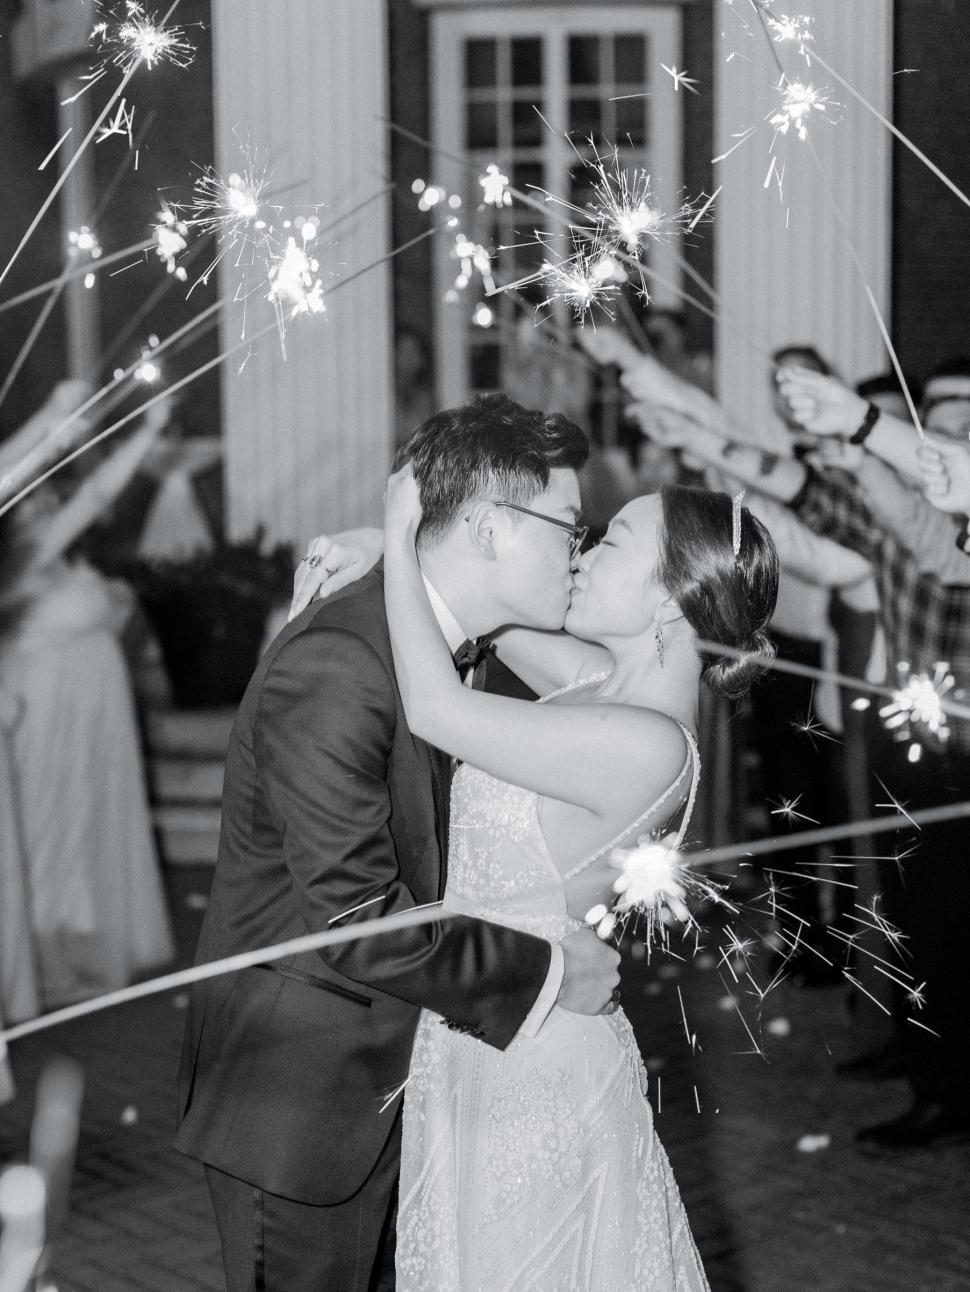 Bourne-Mansion-Wedding-Photos-Cassi-Claire-Long-Island-Wedding-Photographer_53.jpg